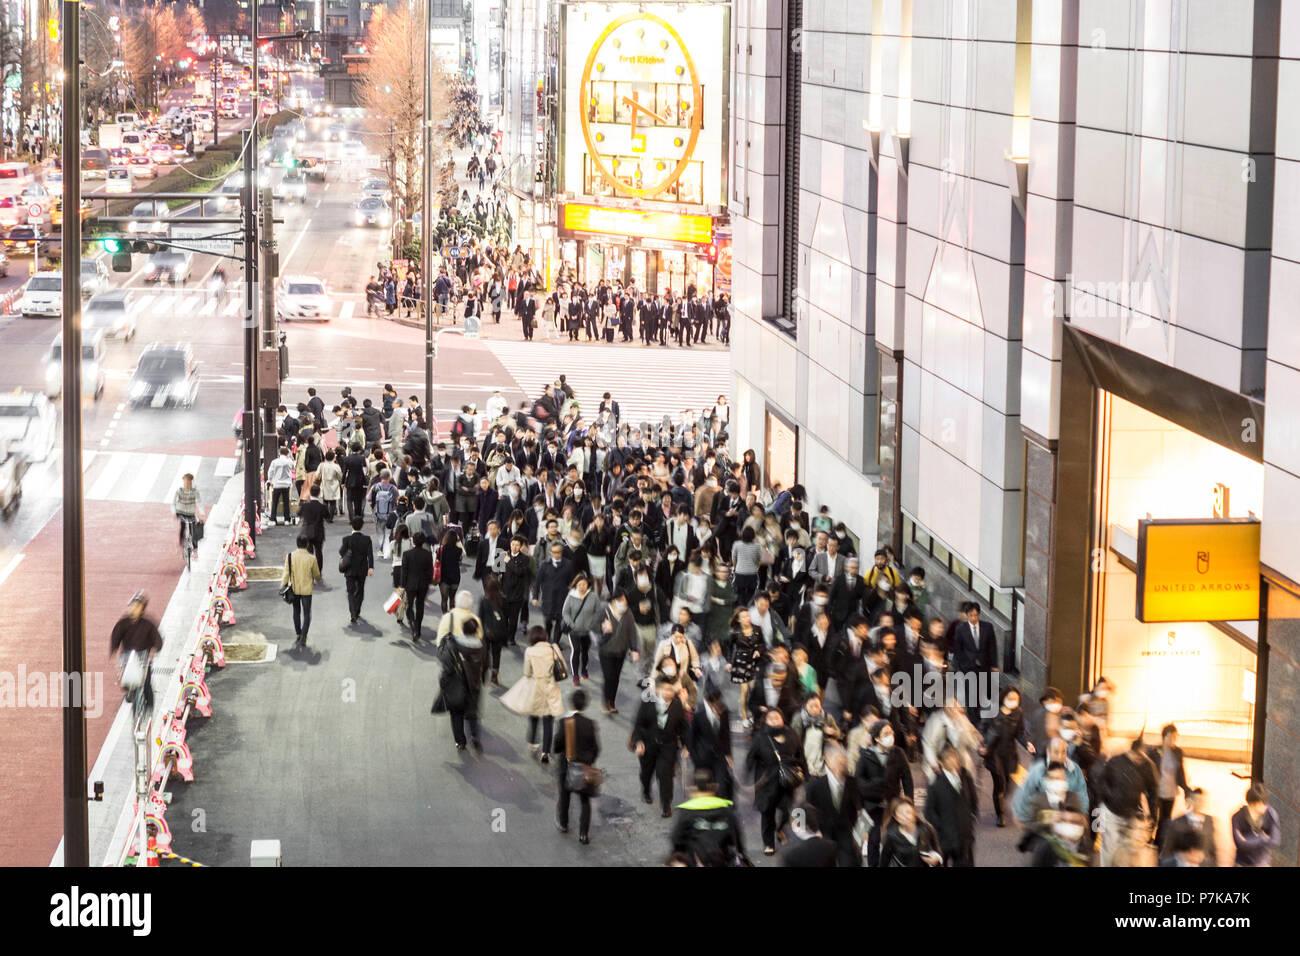 Rush hour in Tokyo - Stock Image